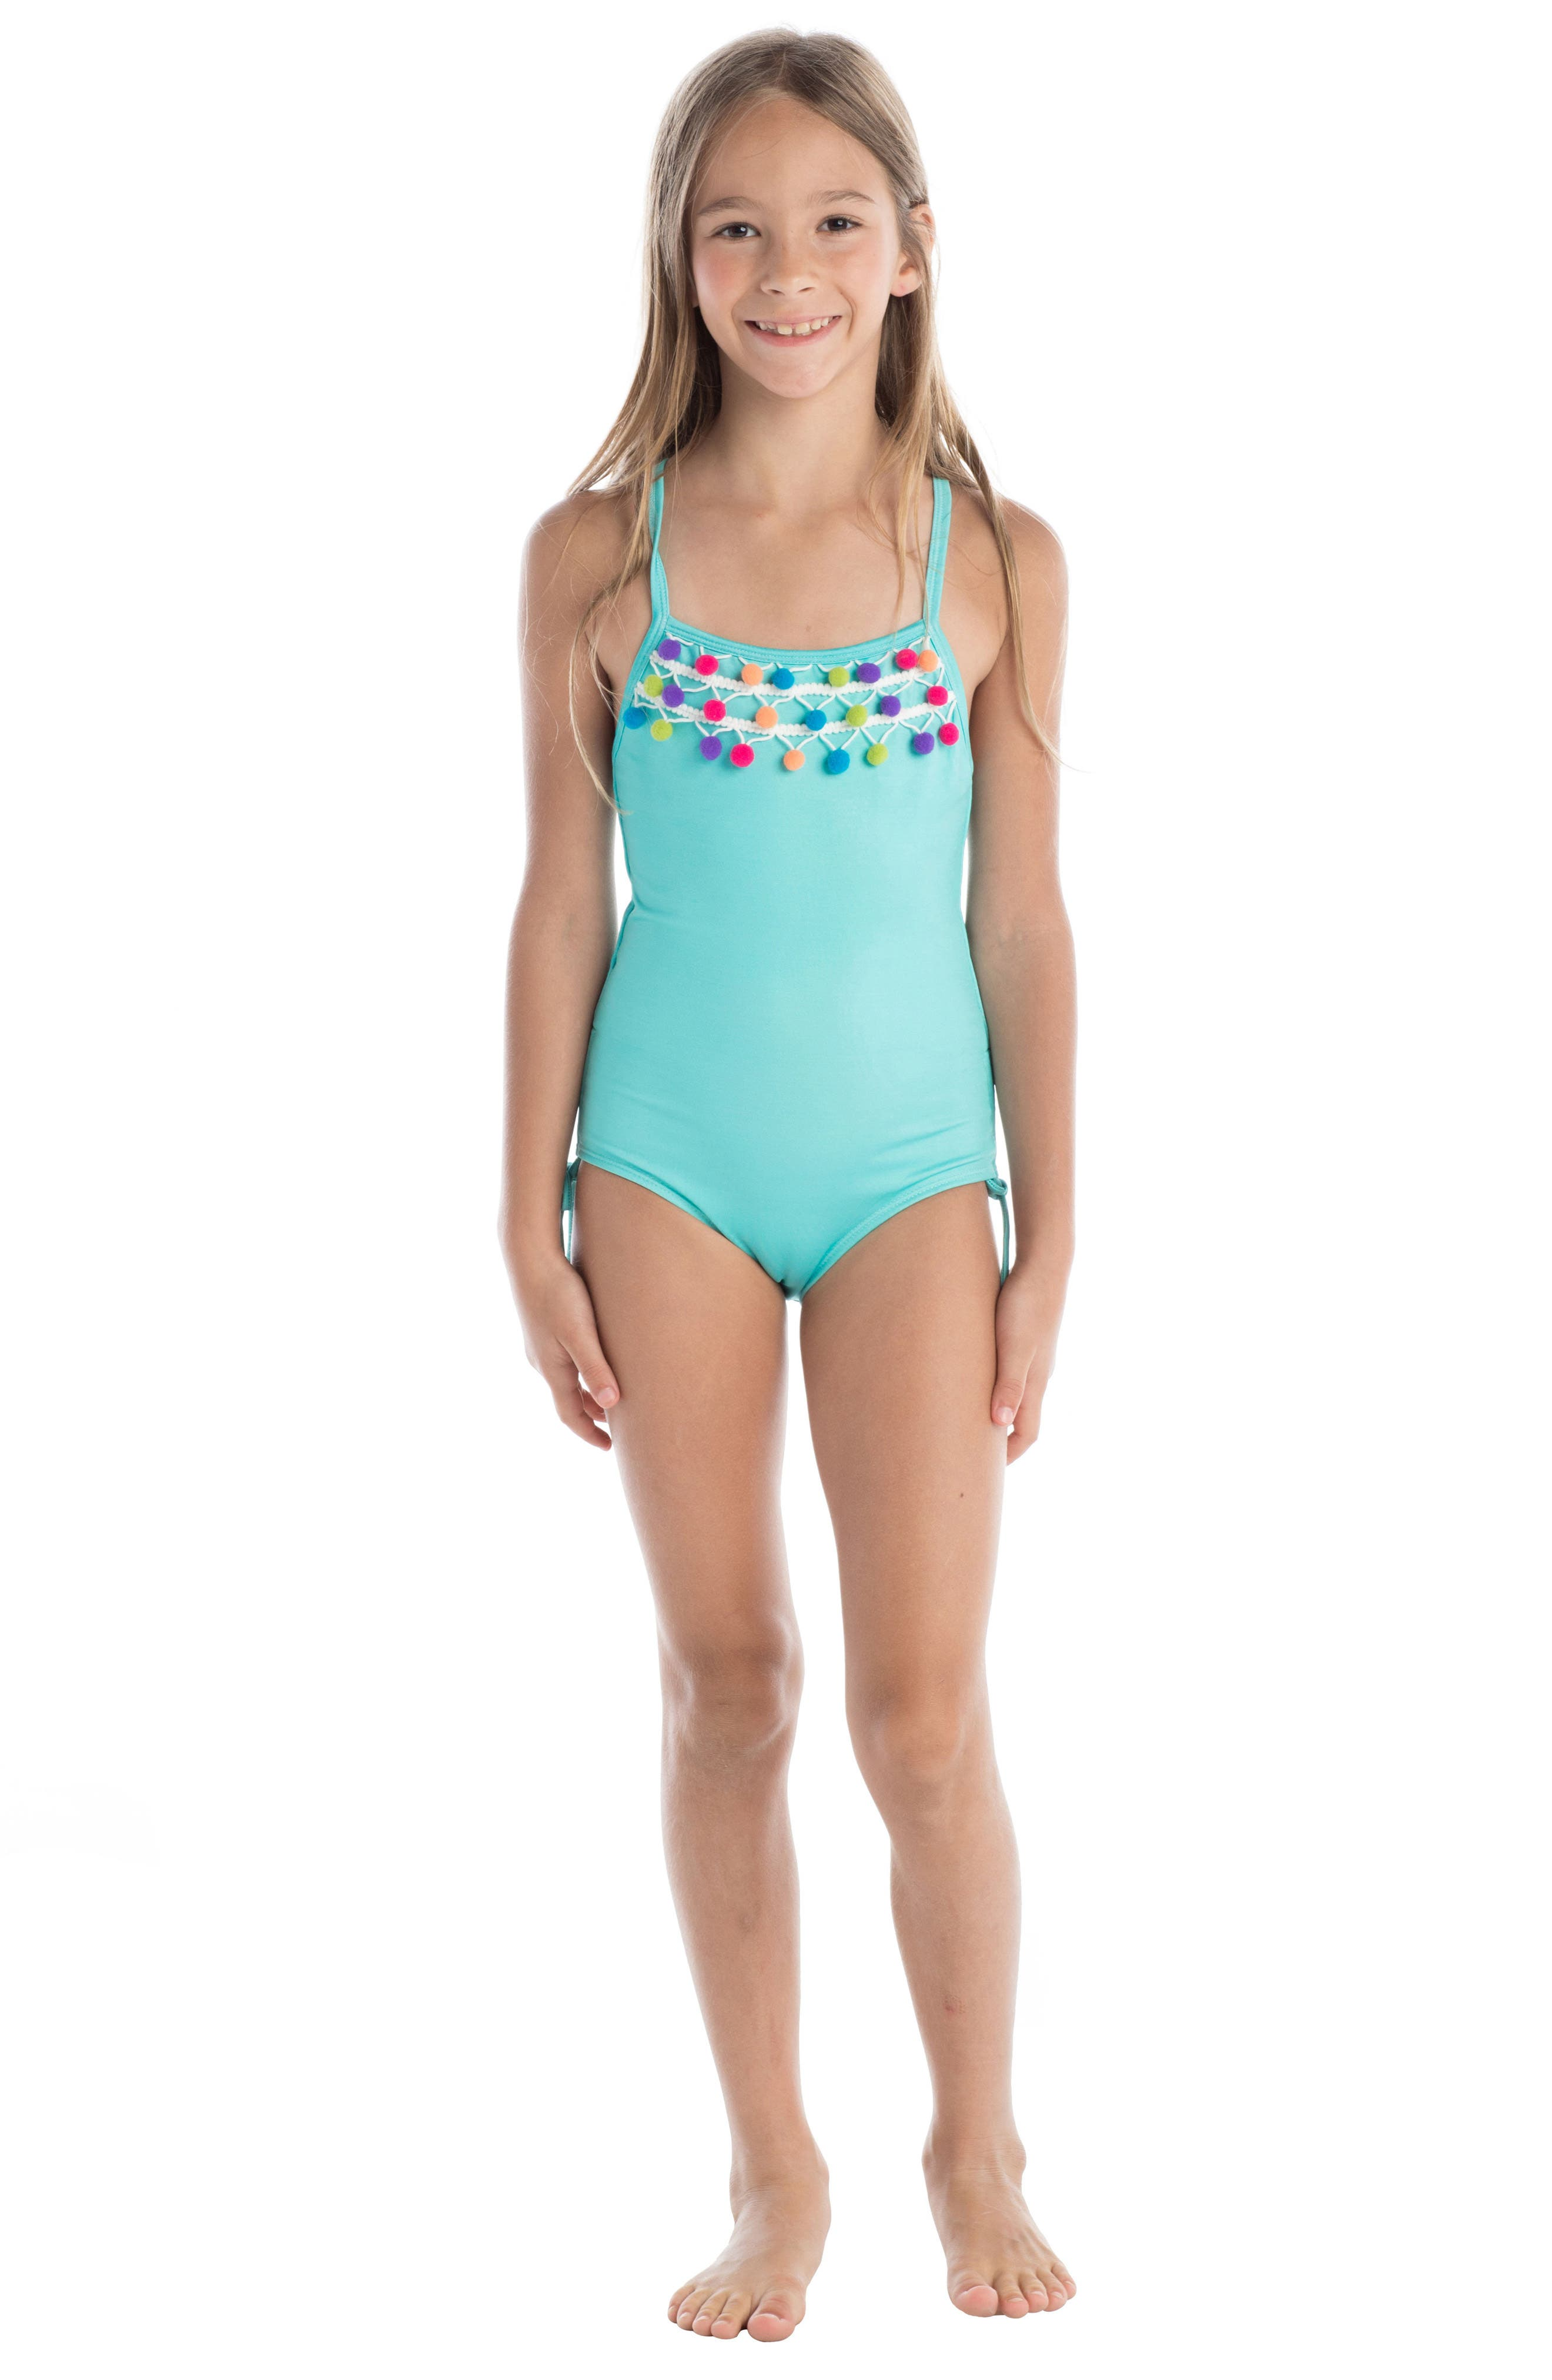 Pompom One-Piece Swimsuit,                             Alternate thumbnail 2, color,                             400